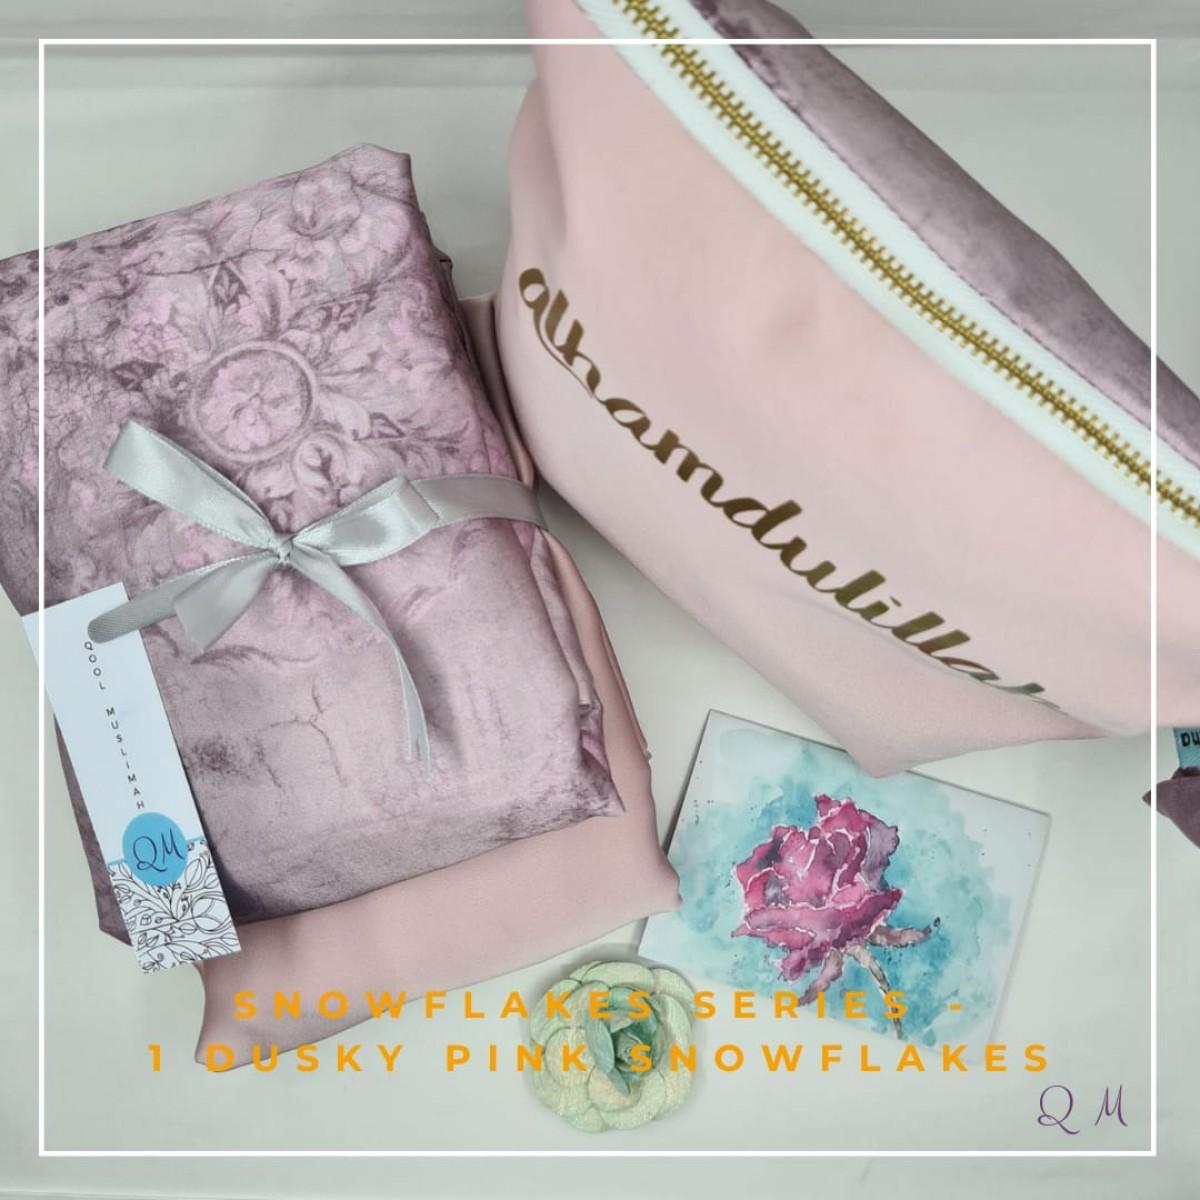 Telekung Silk Snowflakes-Dusky Pink - Qool Muslimah